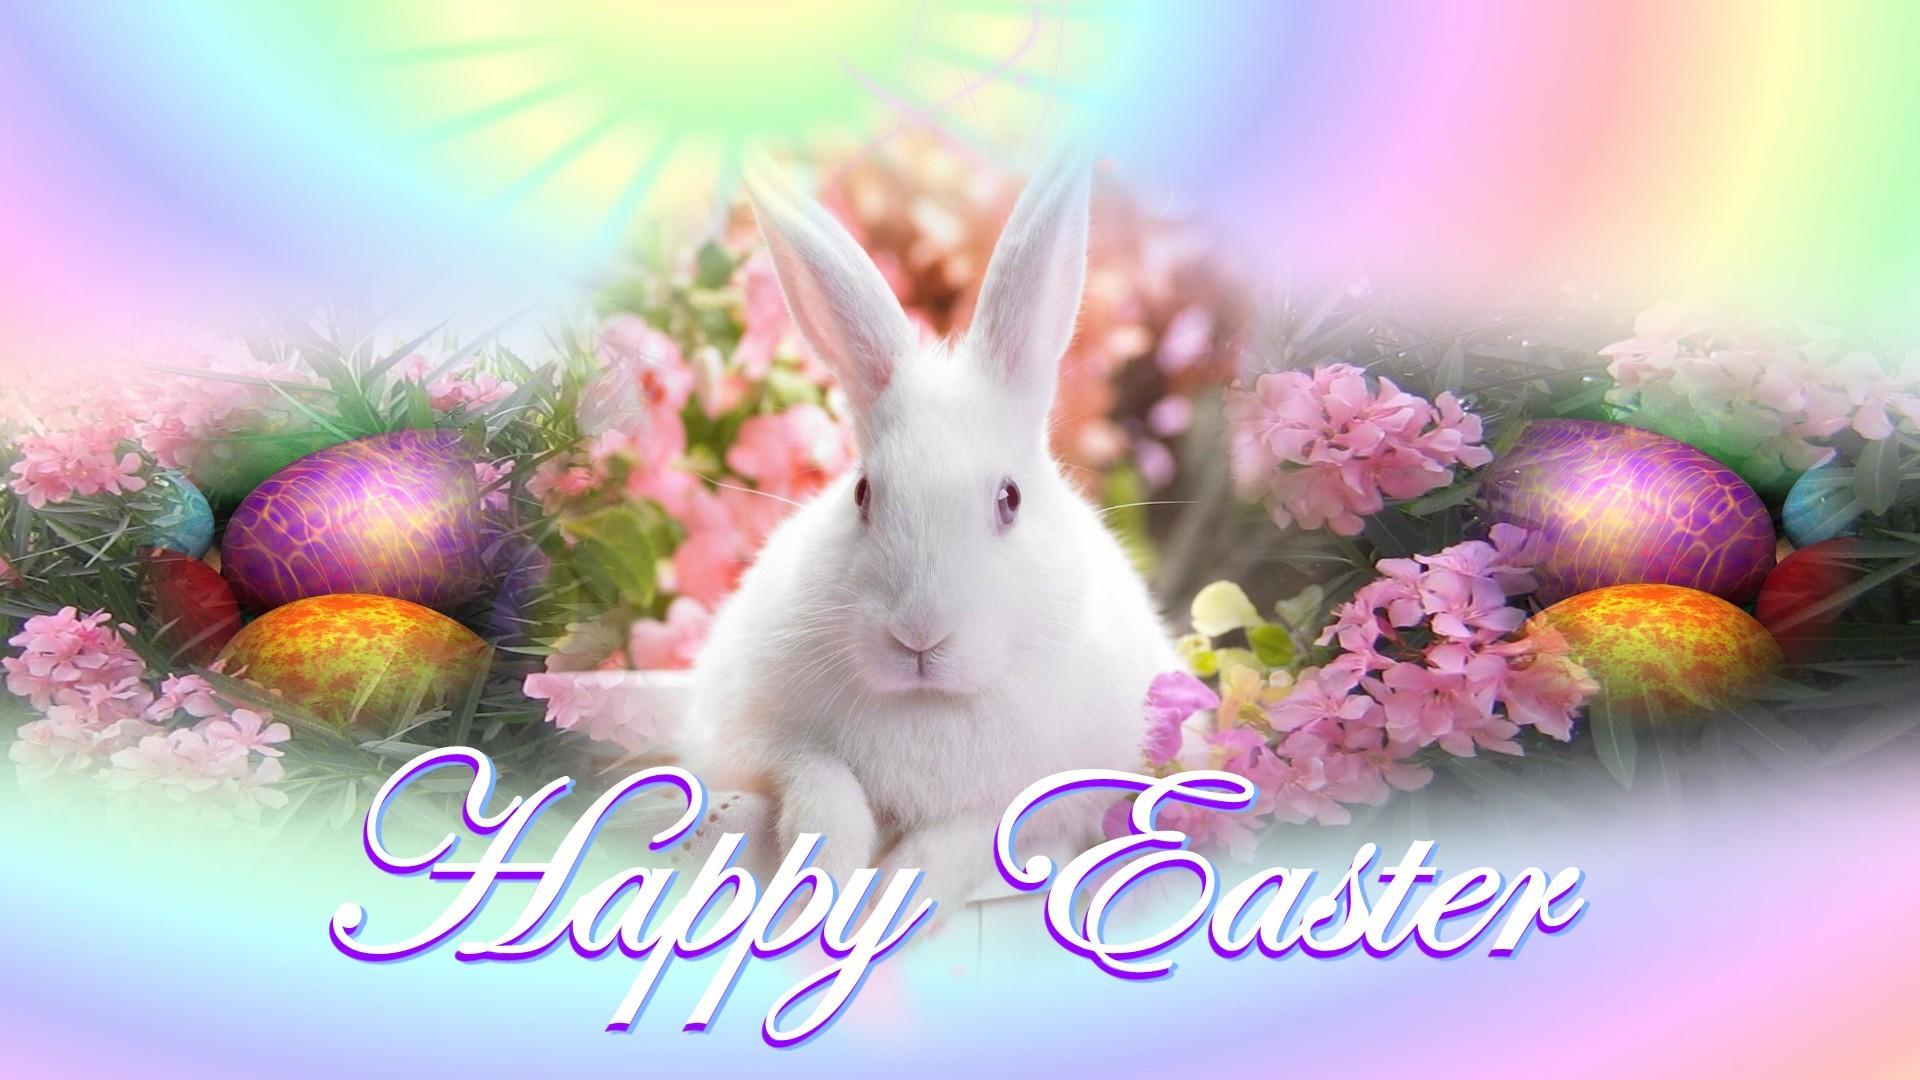 Happy Easter Bunny 2013 Wallpupcom 1920x1080